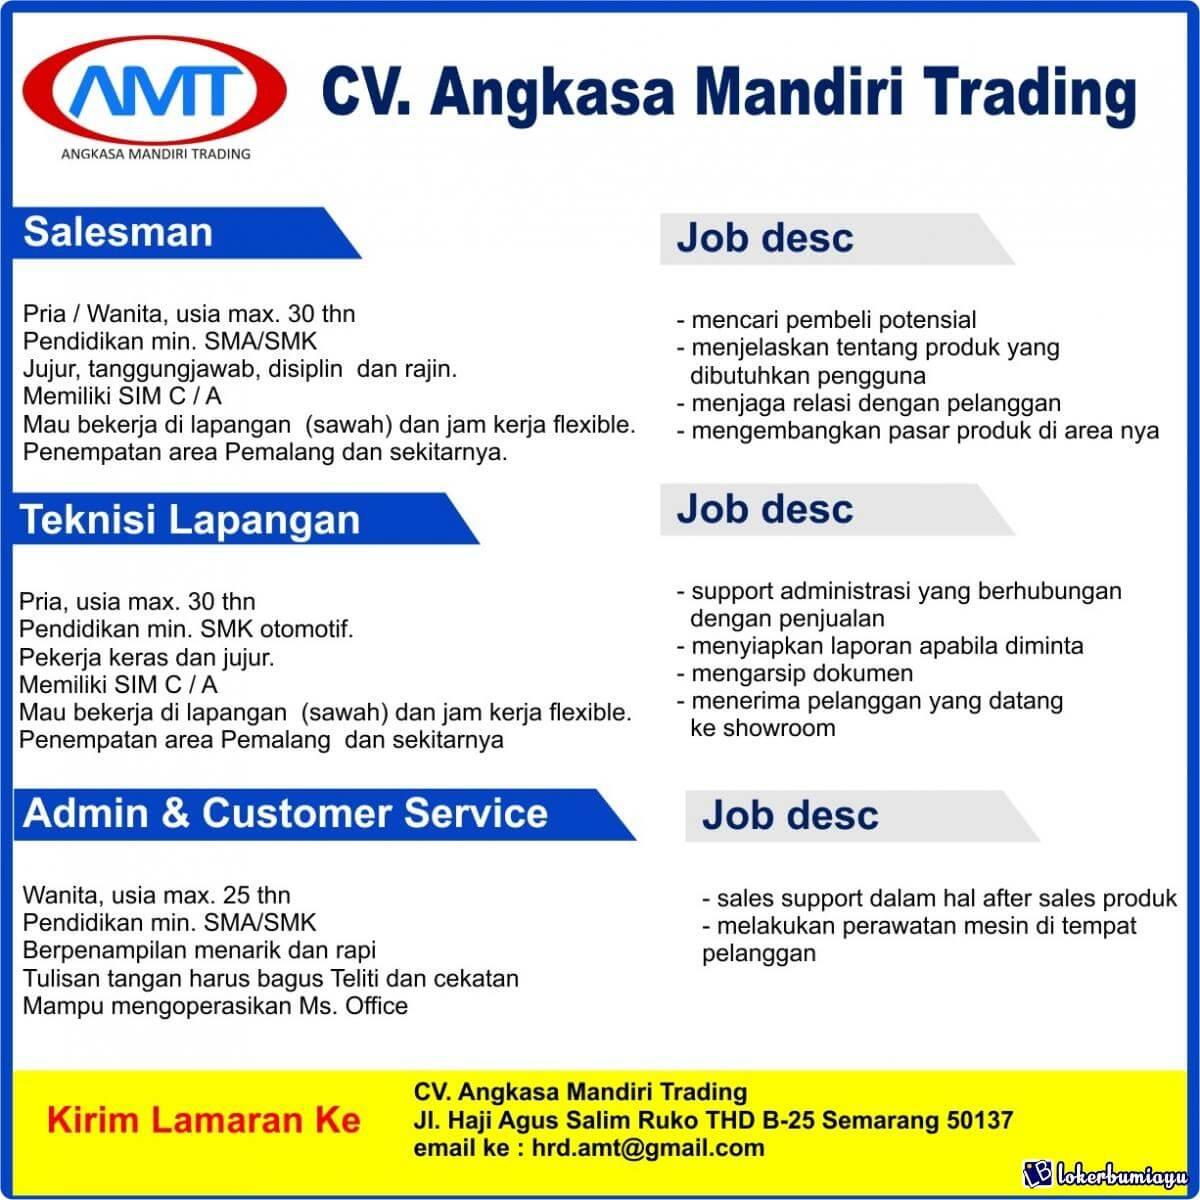 CV Angkasa Mandiri Trading